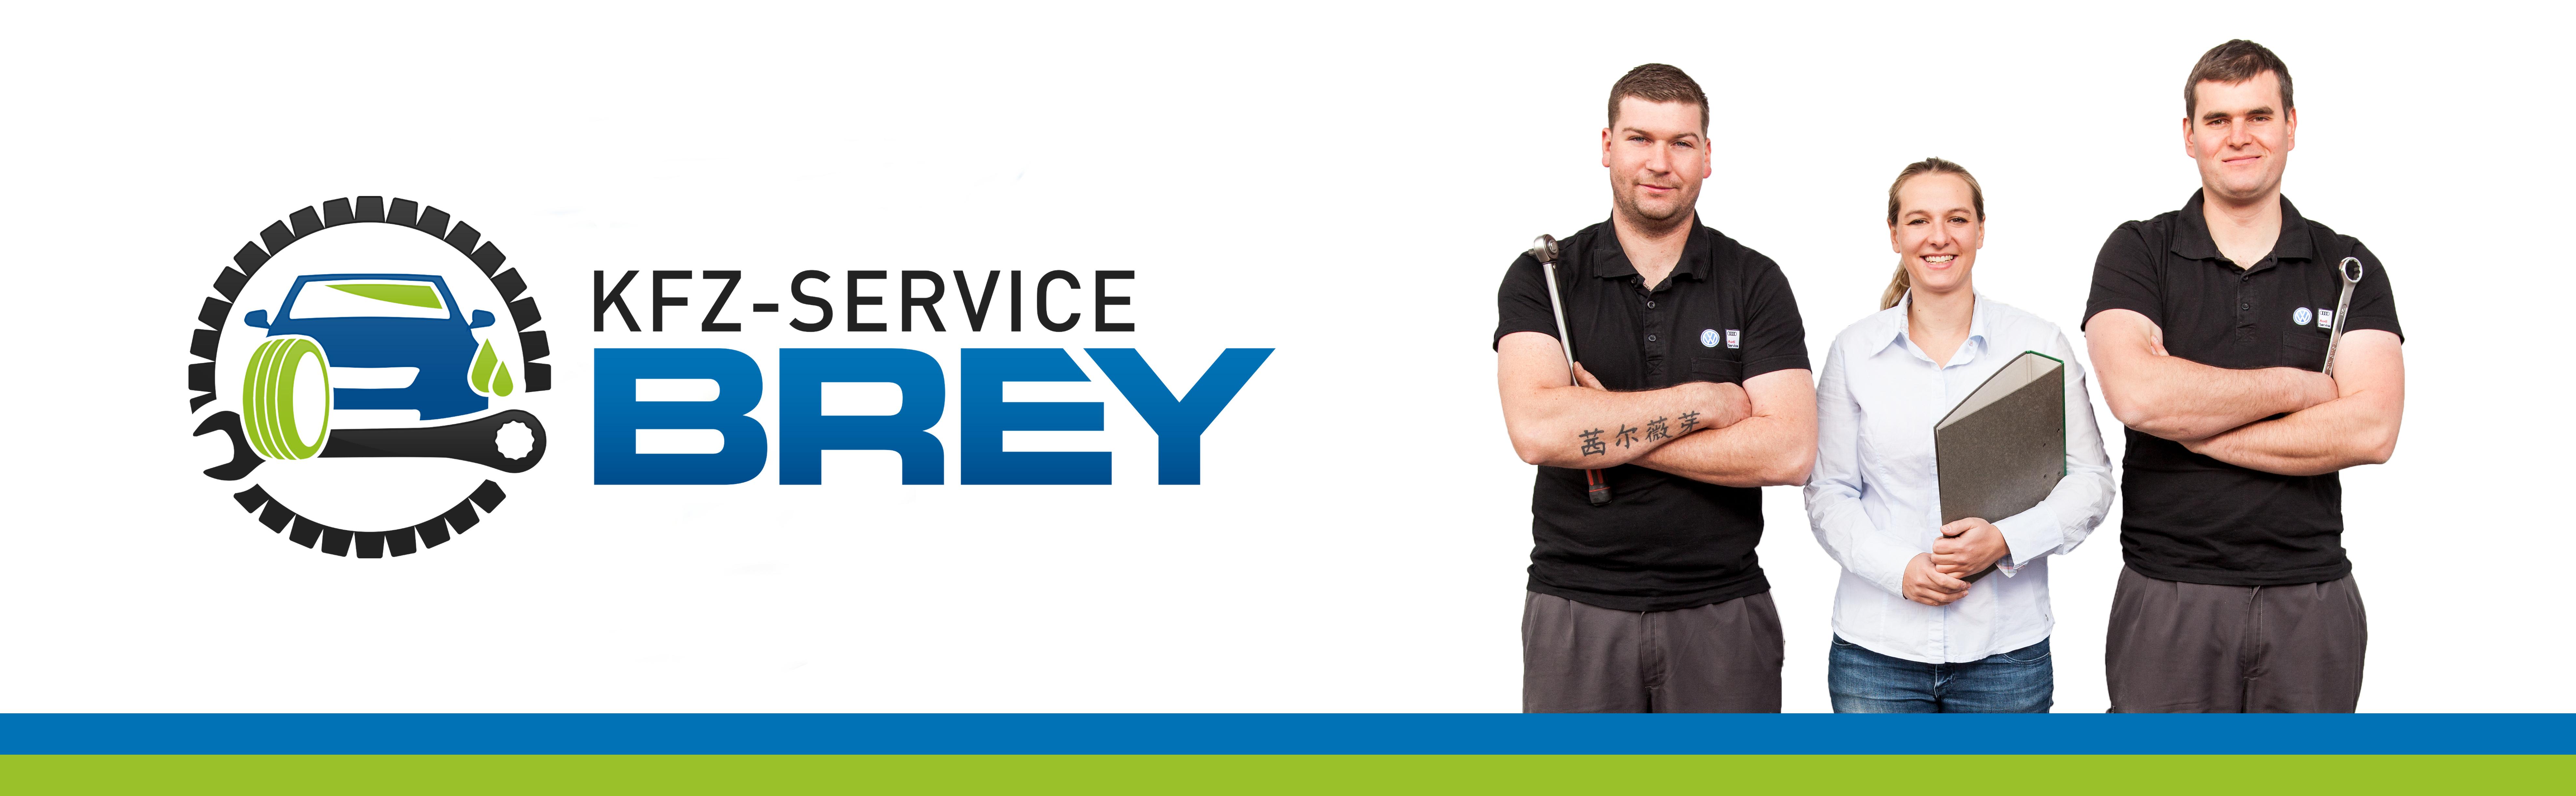 Kfz-Service Brey